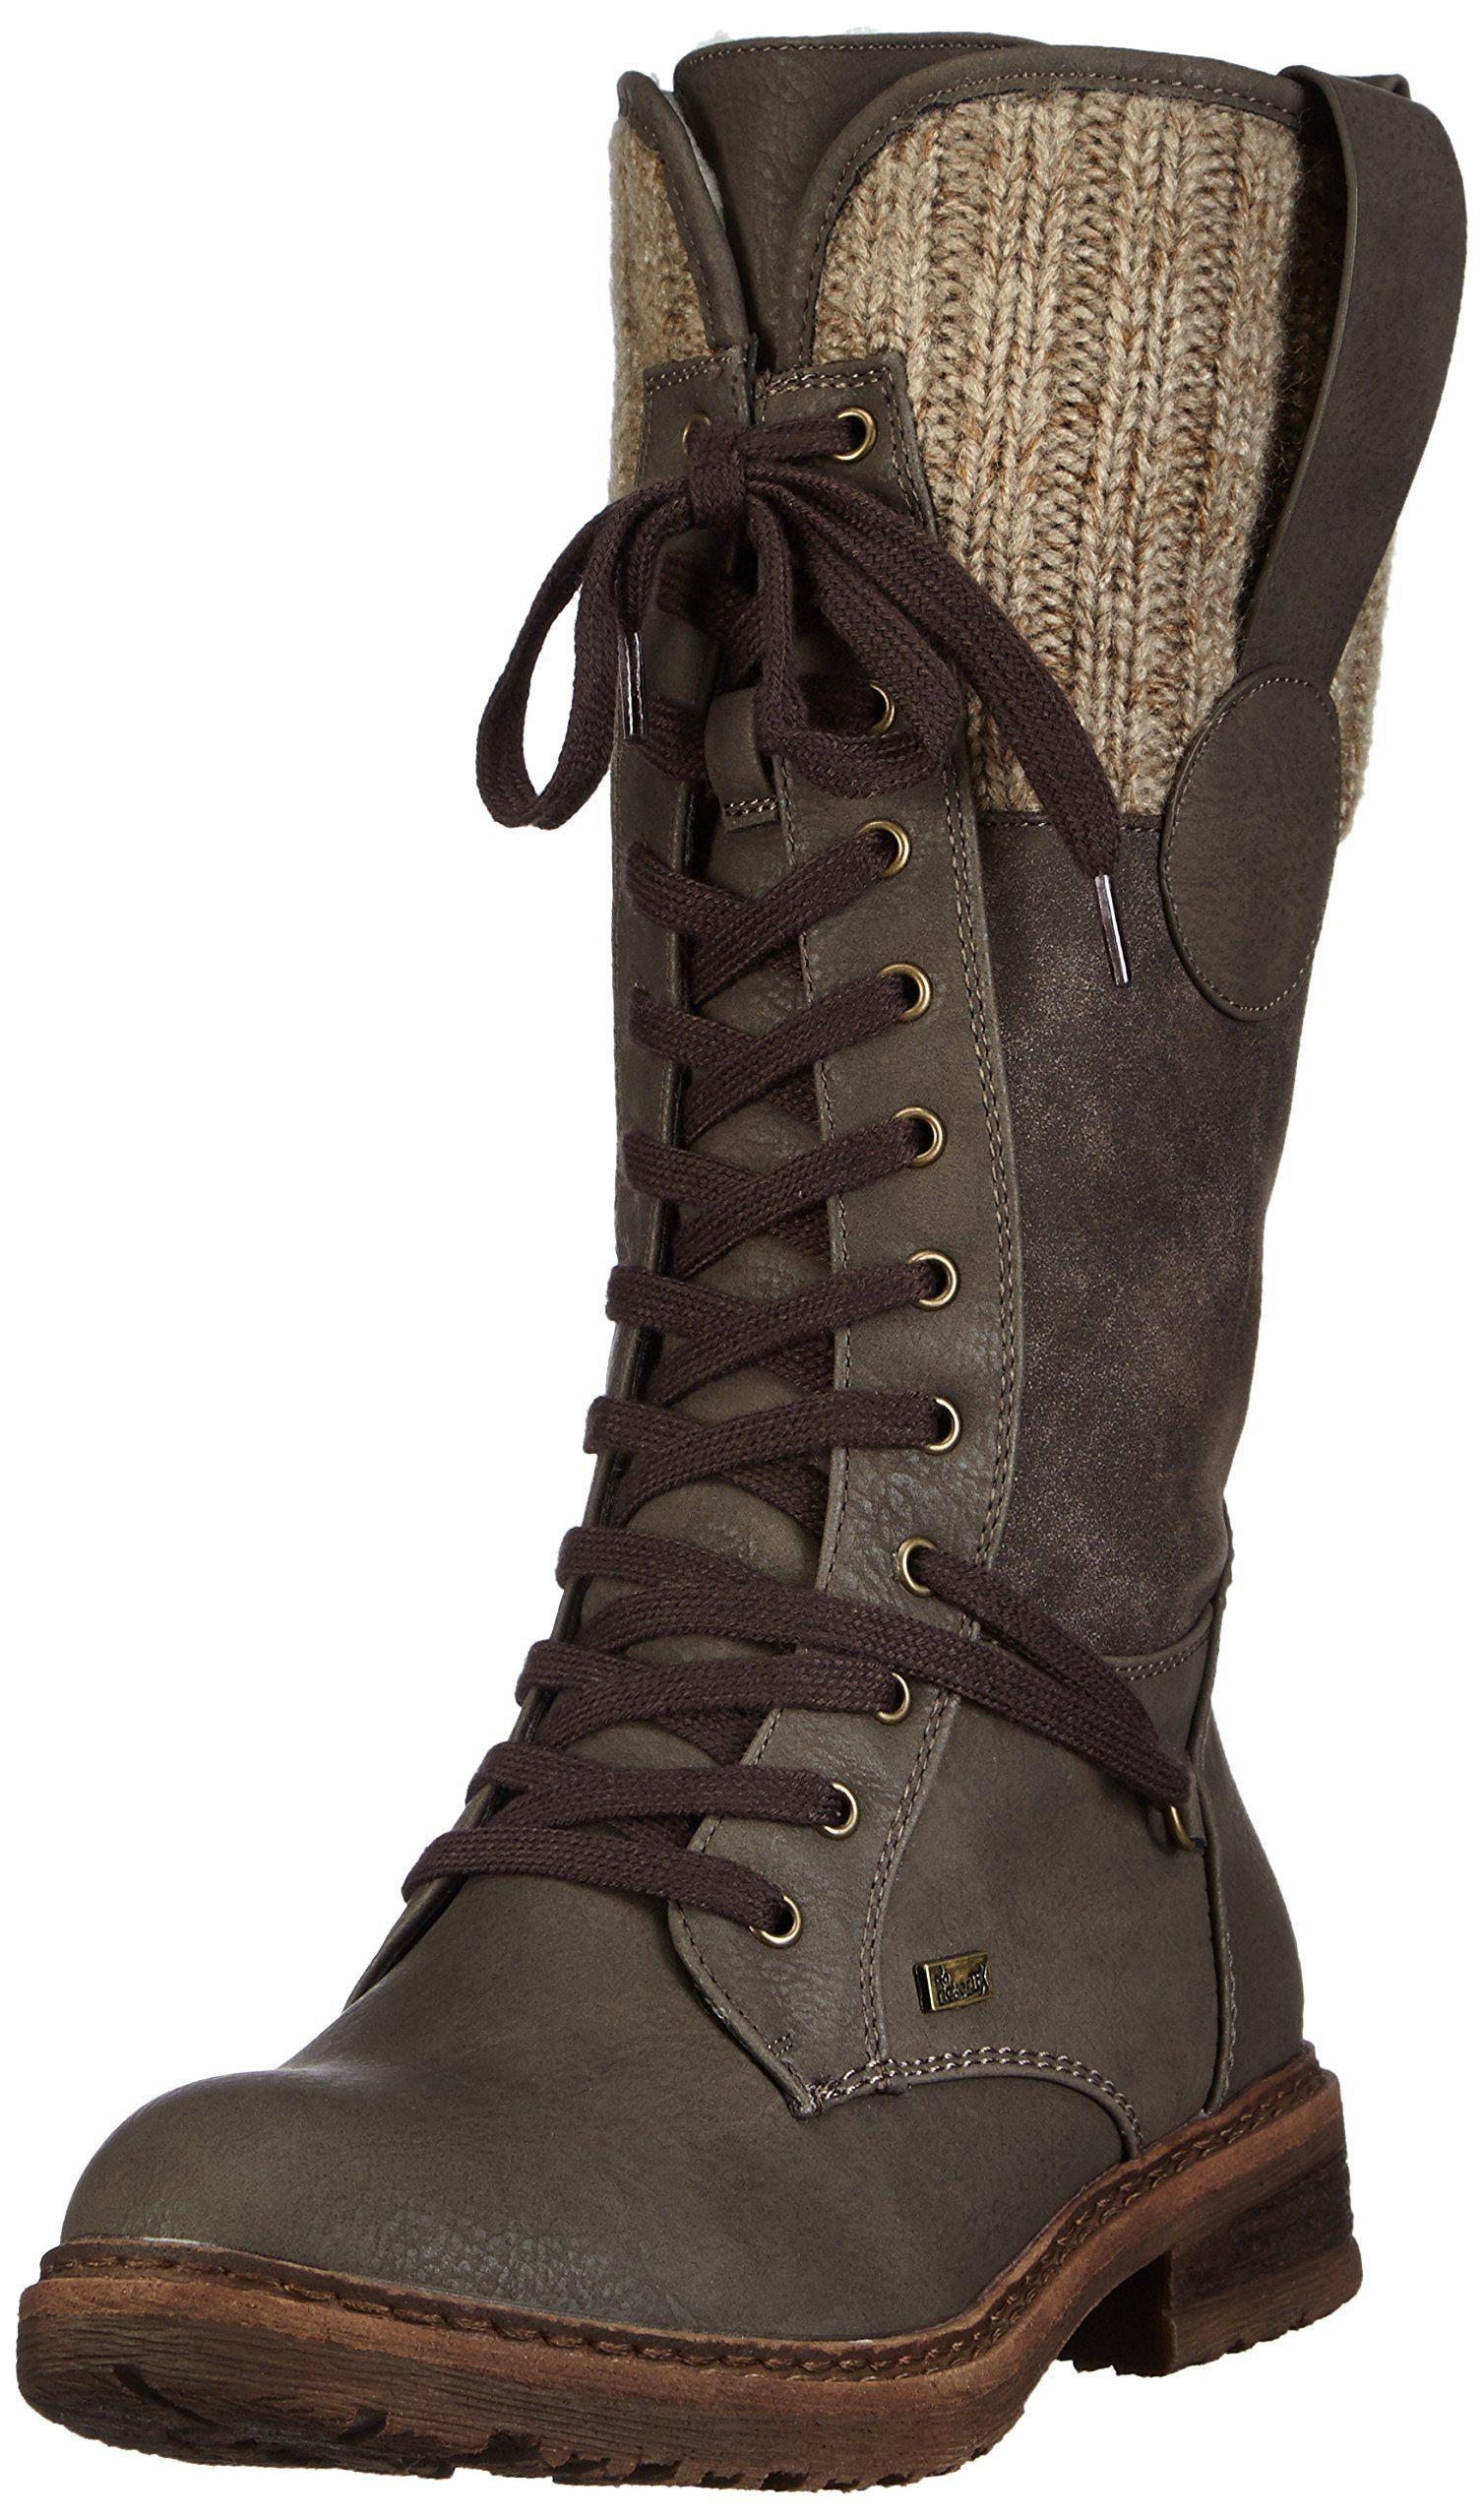 baa1dd2c1c7ad Rieker 94730 45, Bottes femme: Amazon.fr: Chaussures et Sacs ...